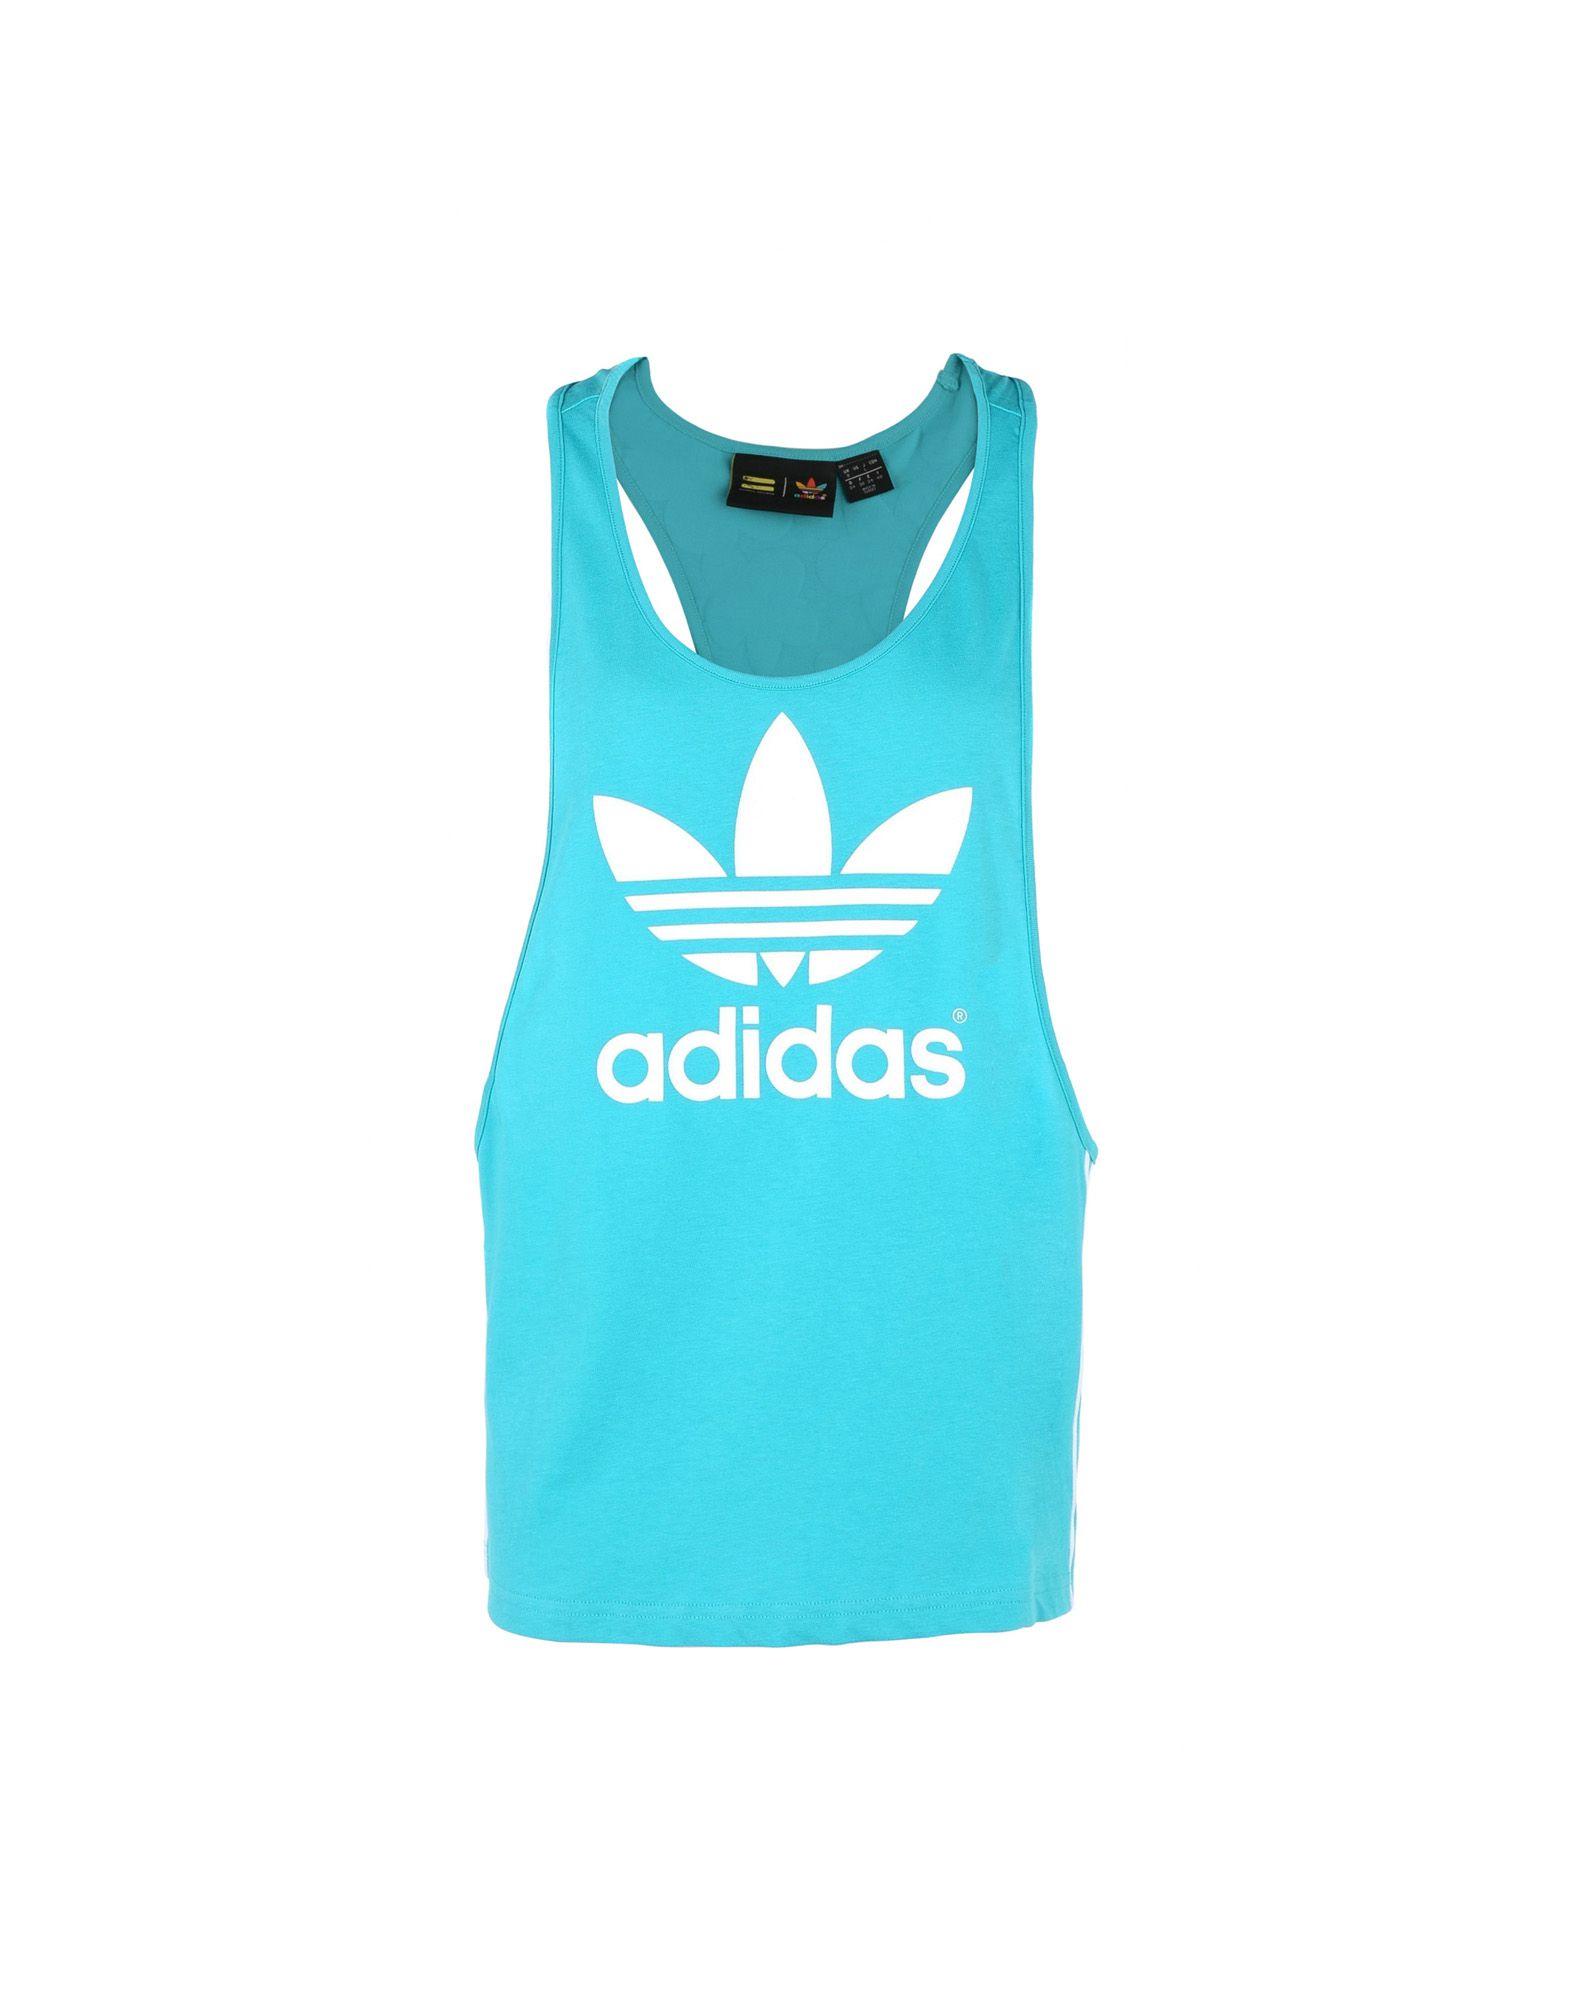 Adidas Williams Sportswear Originals By Rebajas Pharrell Pwx0H0q